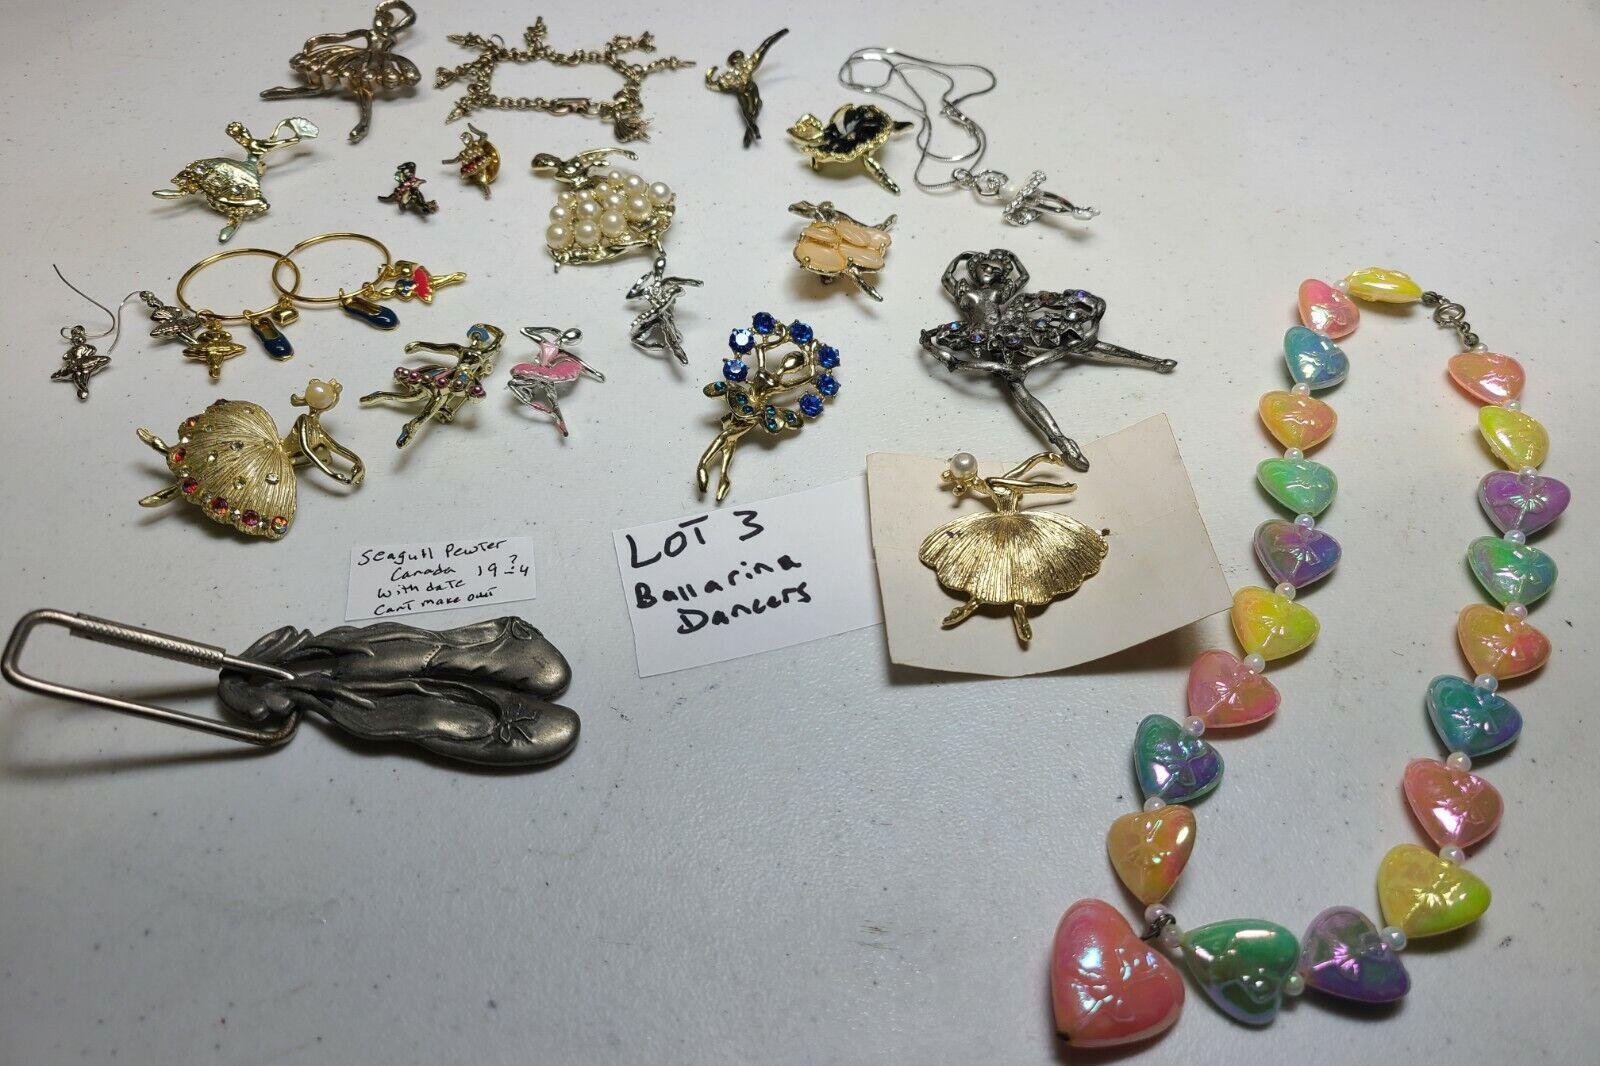 Huge Lot 24Pc All Vtg Ballerina Dancer Jewelry Rhinestone Brooch Pin Enamel  - $26.00